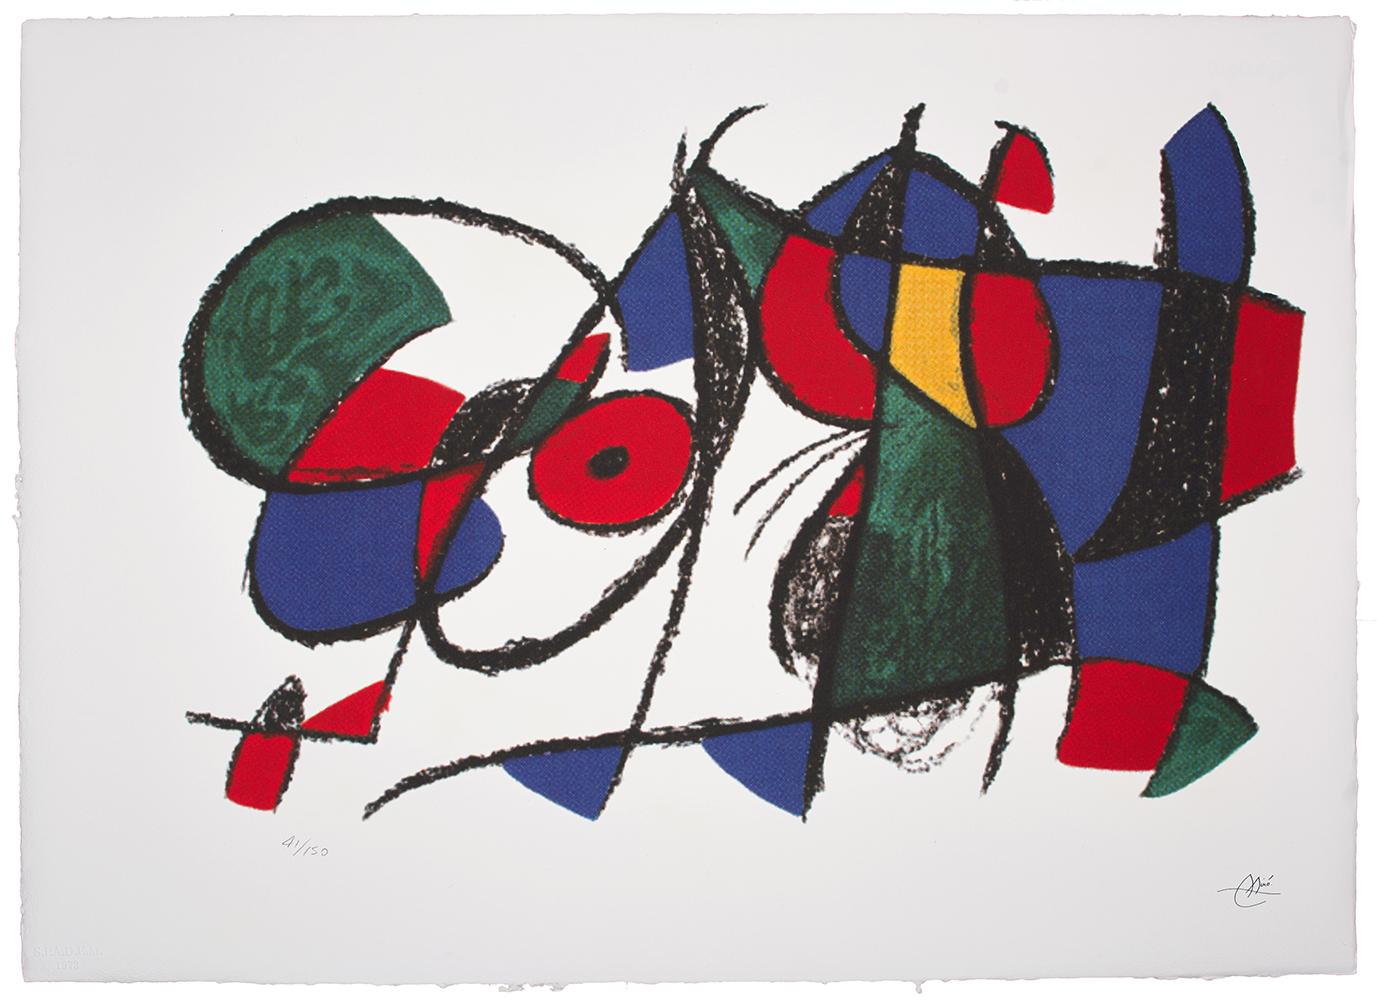 Miro Joan, Kompozycja...